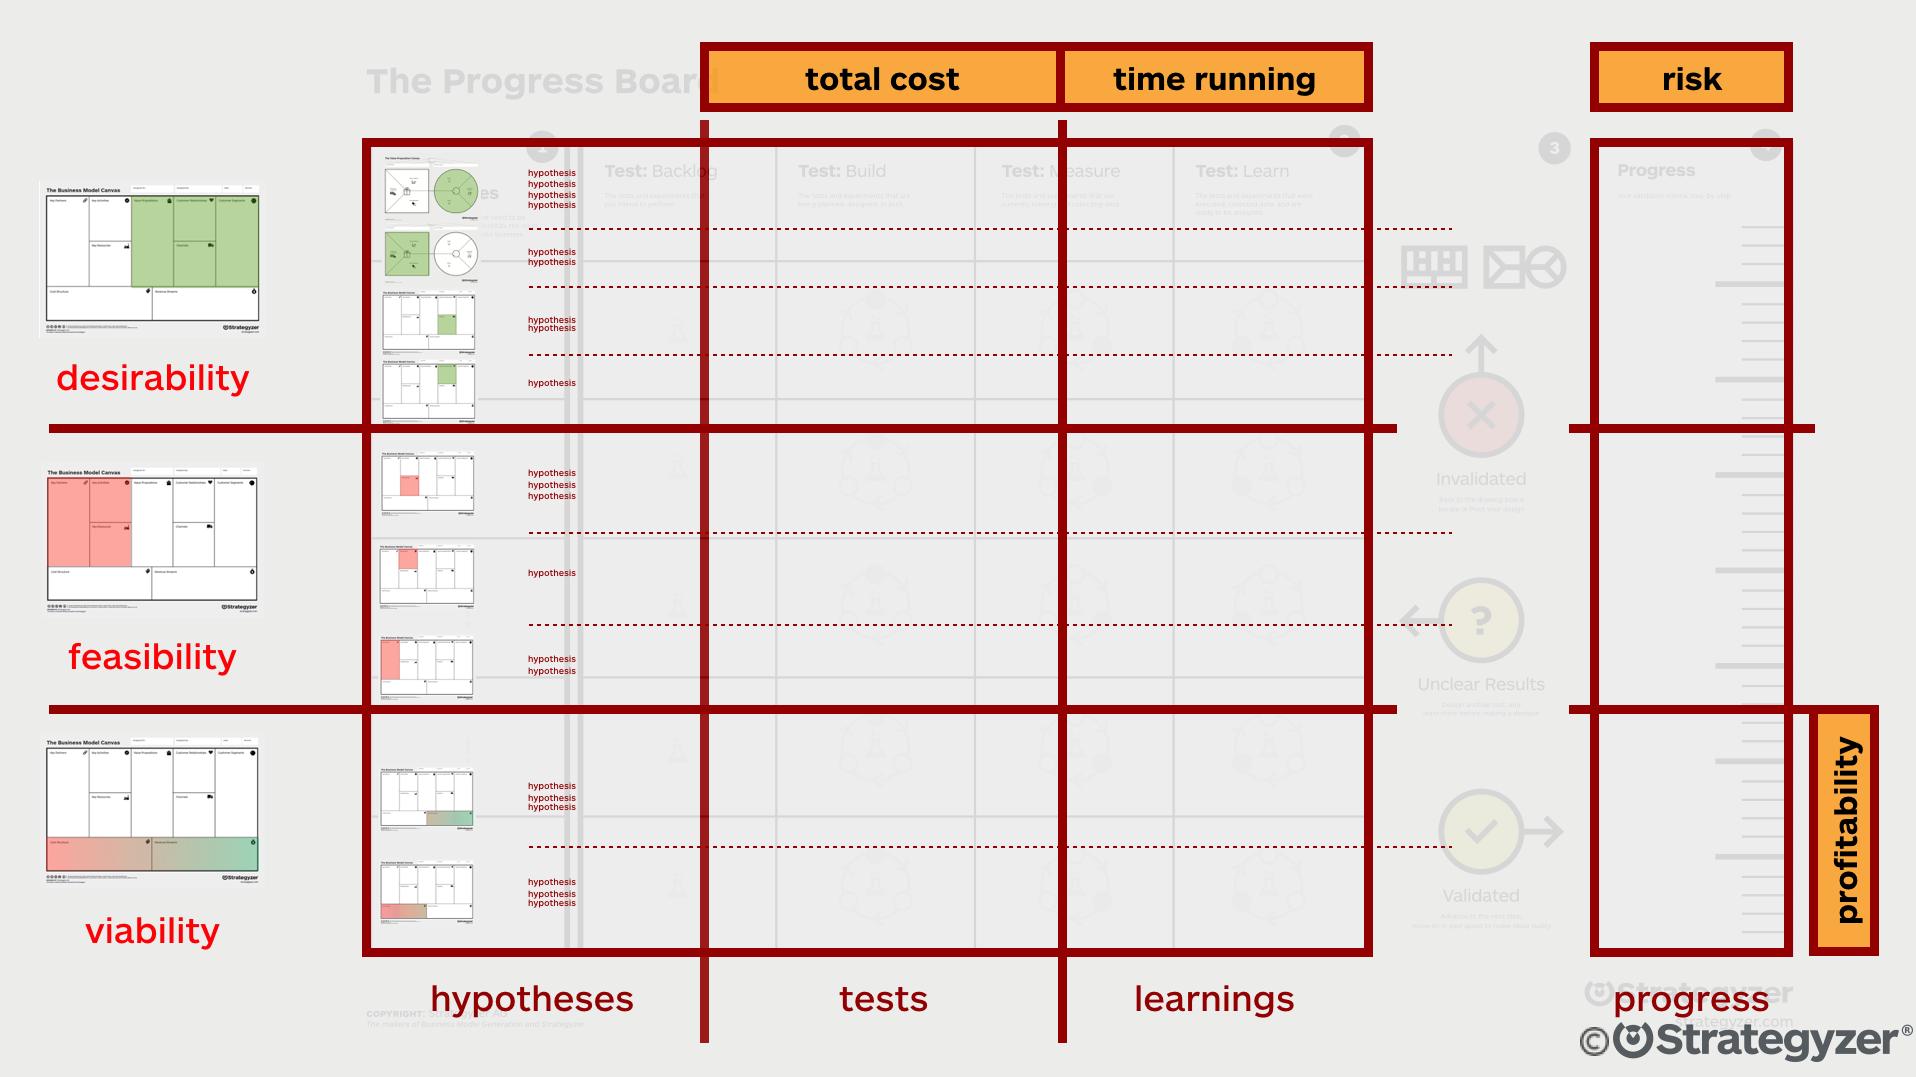 Innovation_Accounting_Progress_Strategyzer